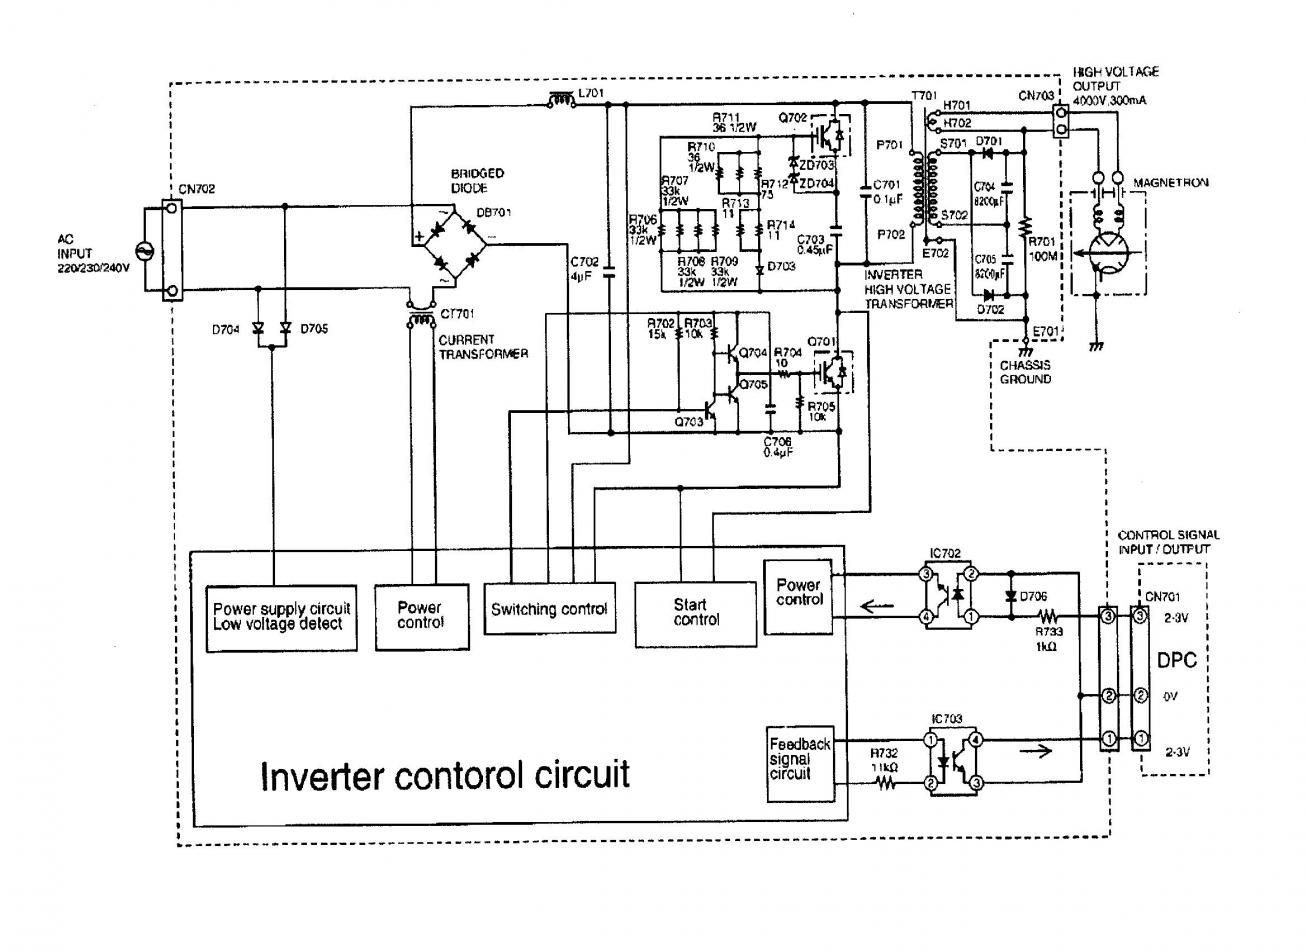 Viking Refrigerator Wiring Diagram Microwave Oven Schematic Microwave Schematic Diagram J